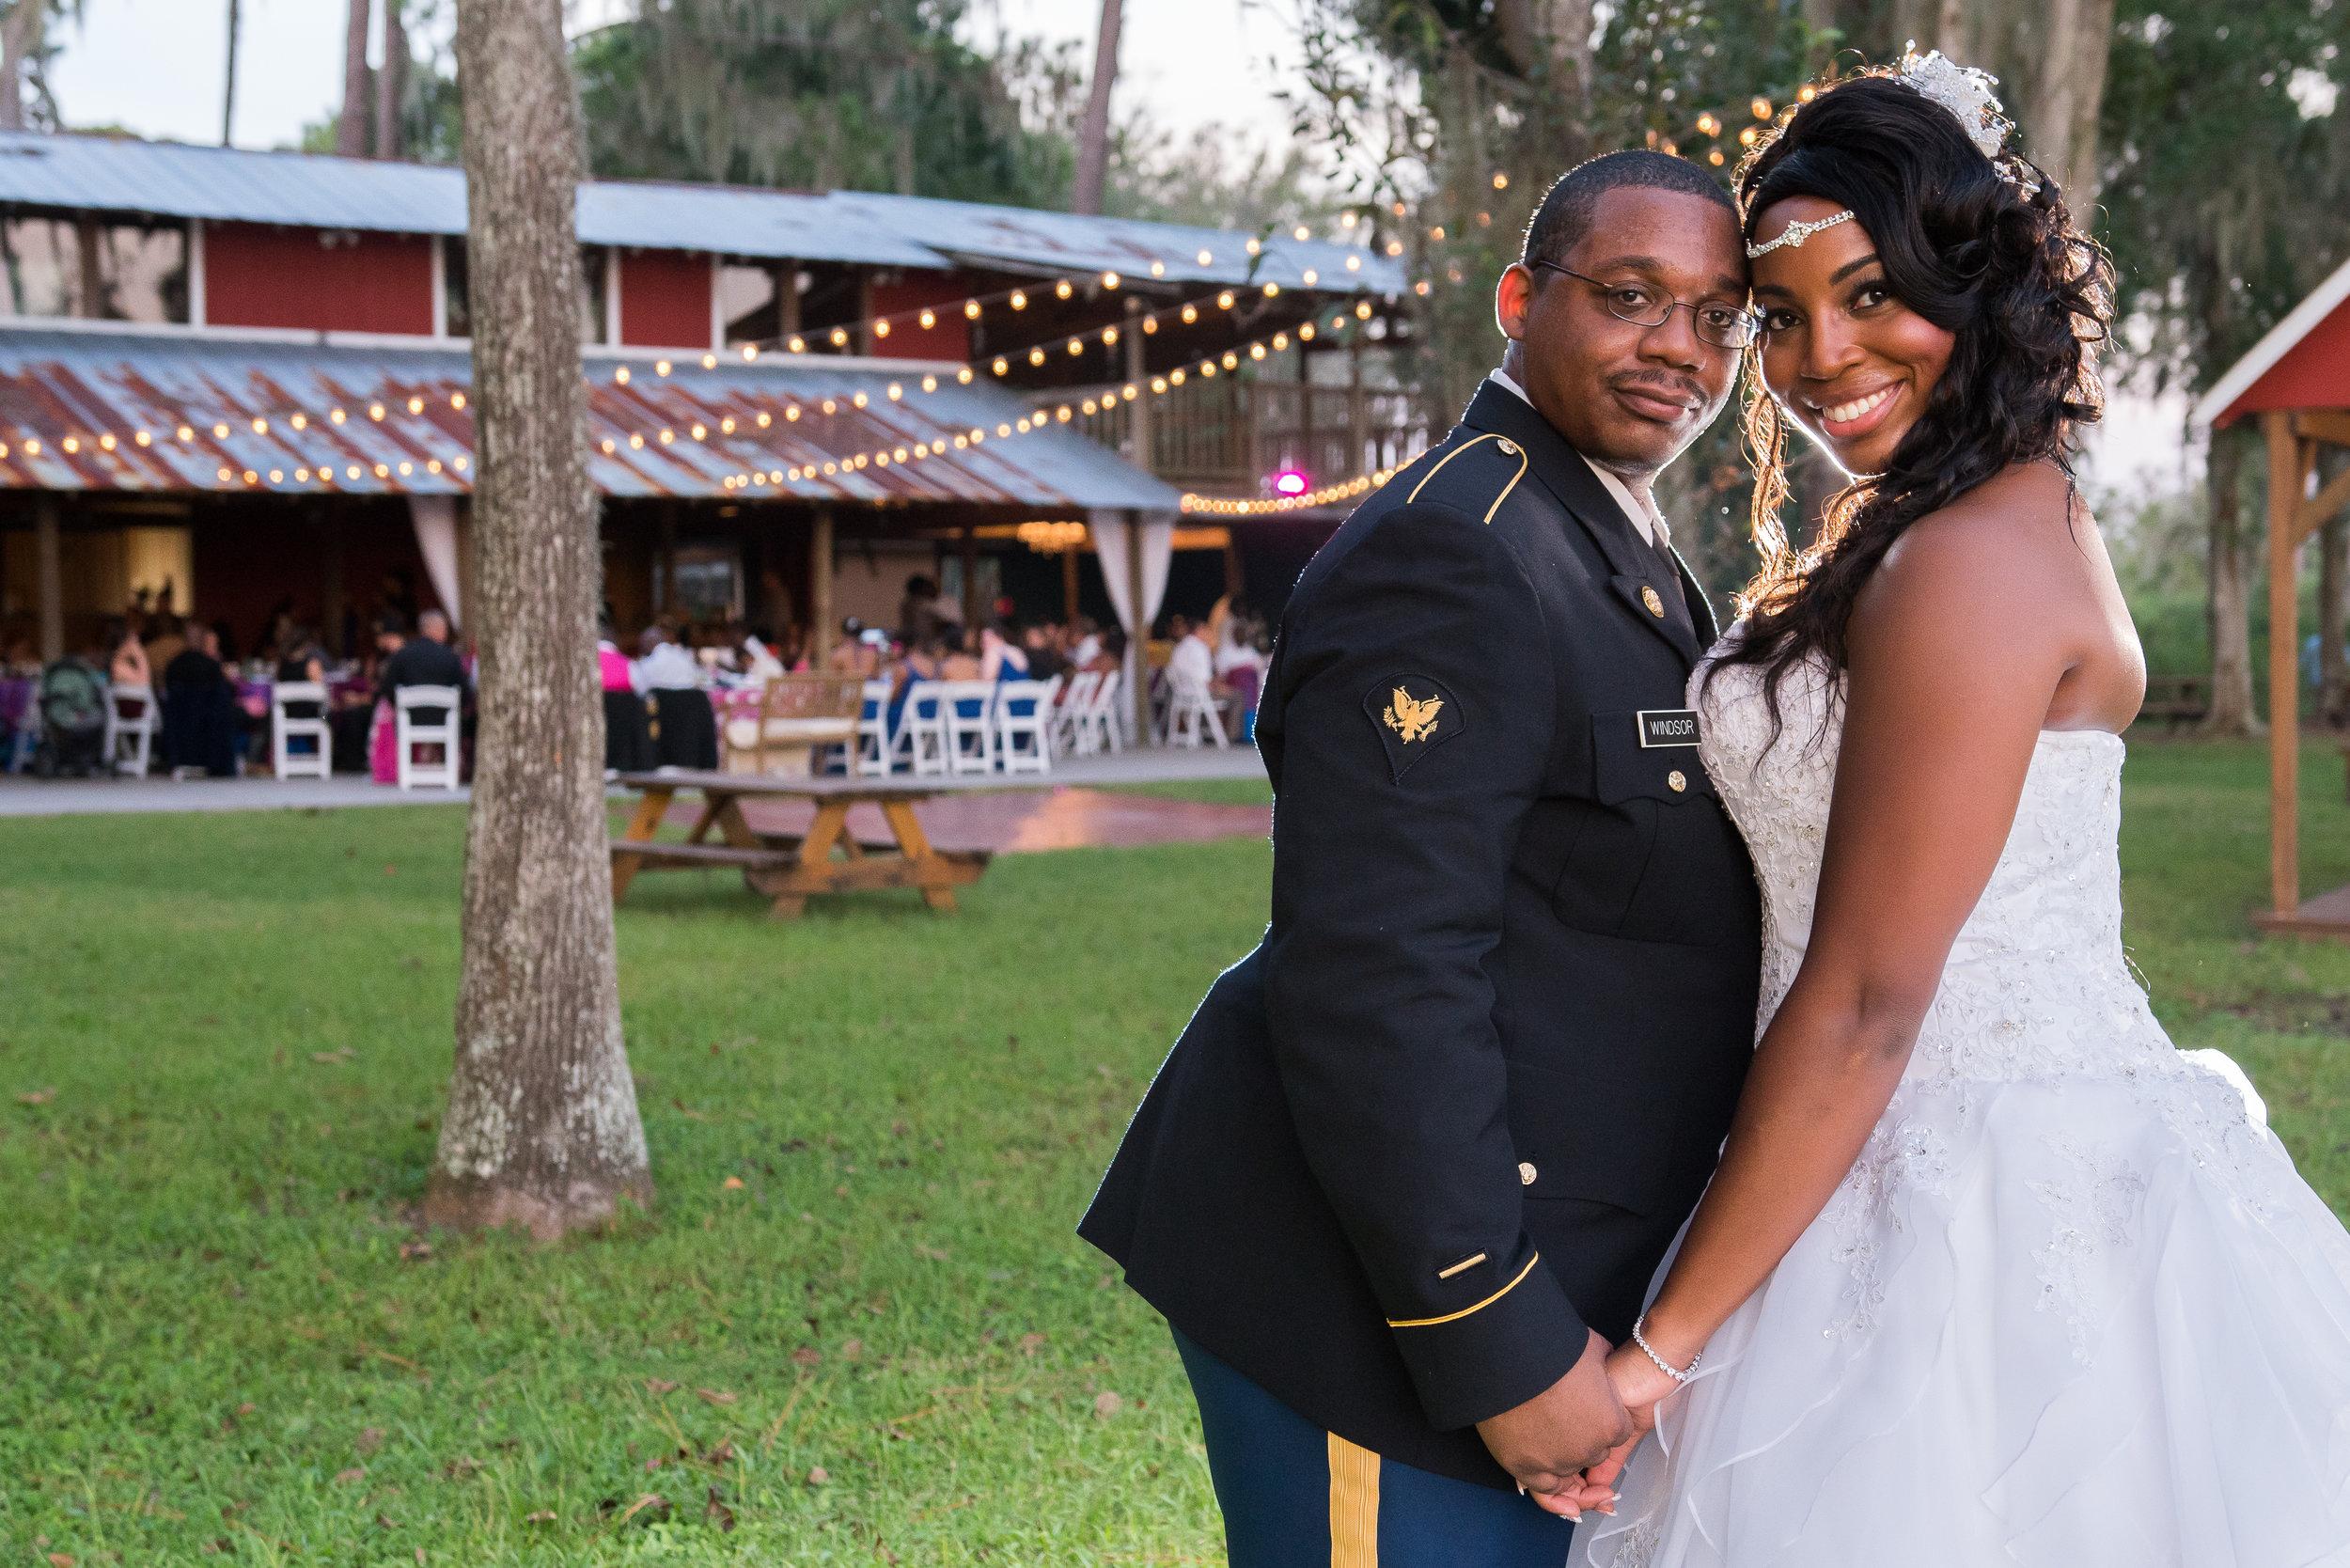 Tampa wedding photographer, Tampa weddings, Old McMicky's Farm wedding